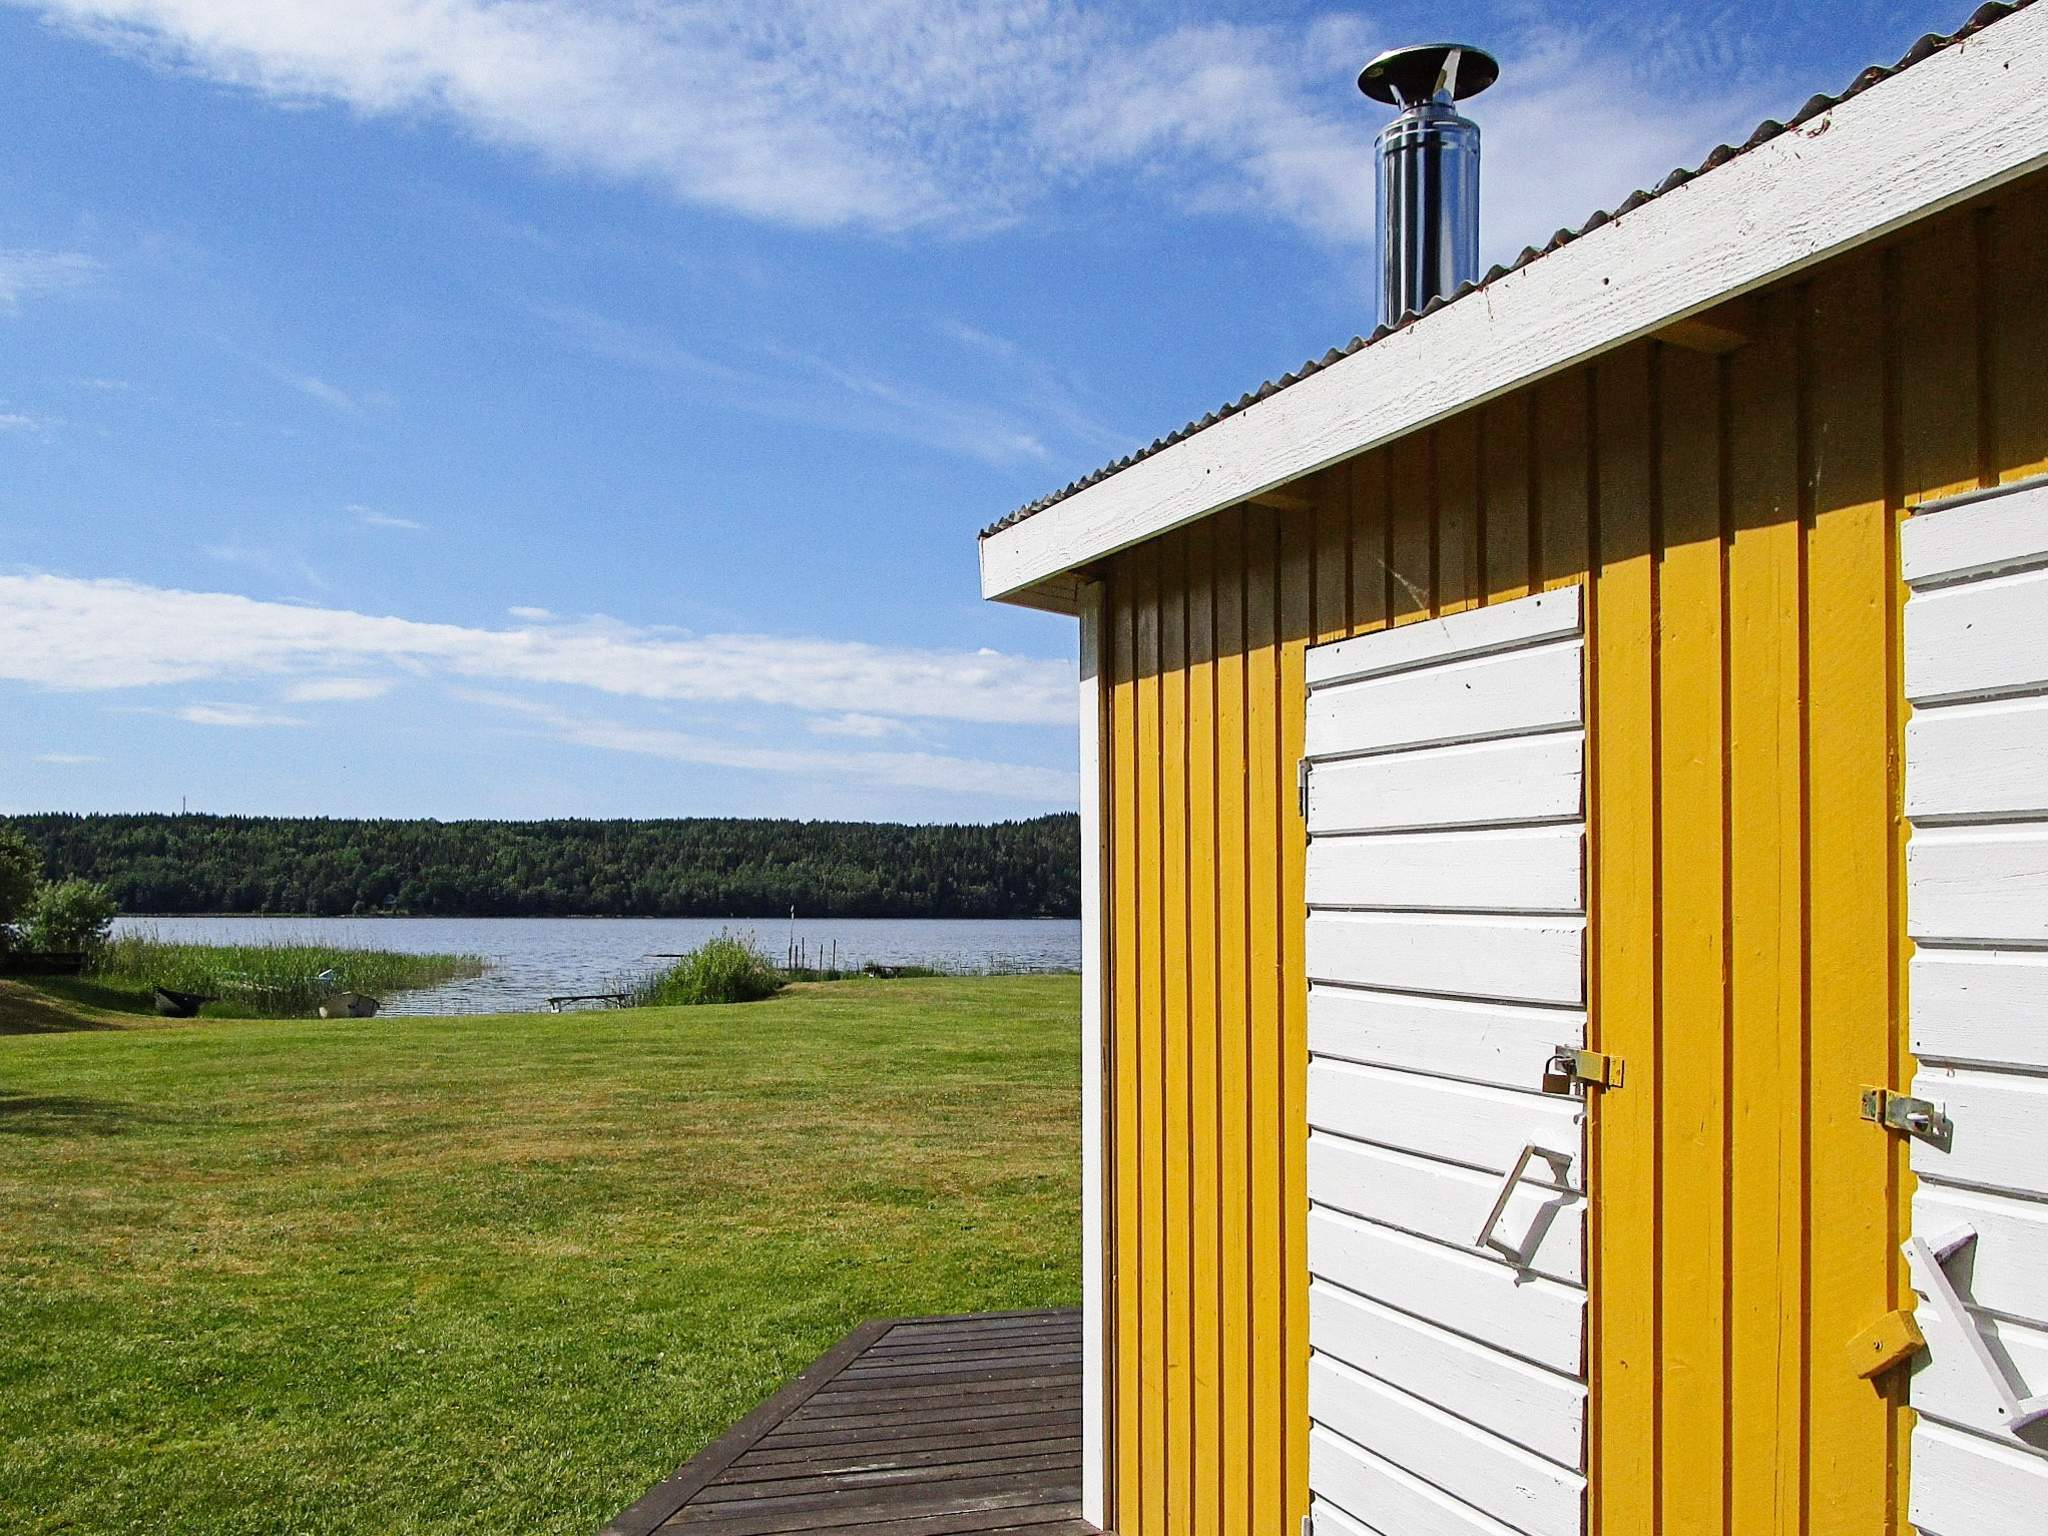 Ferienhaus Melldala (82014), Lerdala, Västra Götaland län, Westschweden, Schweden, Bild 14